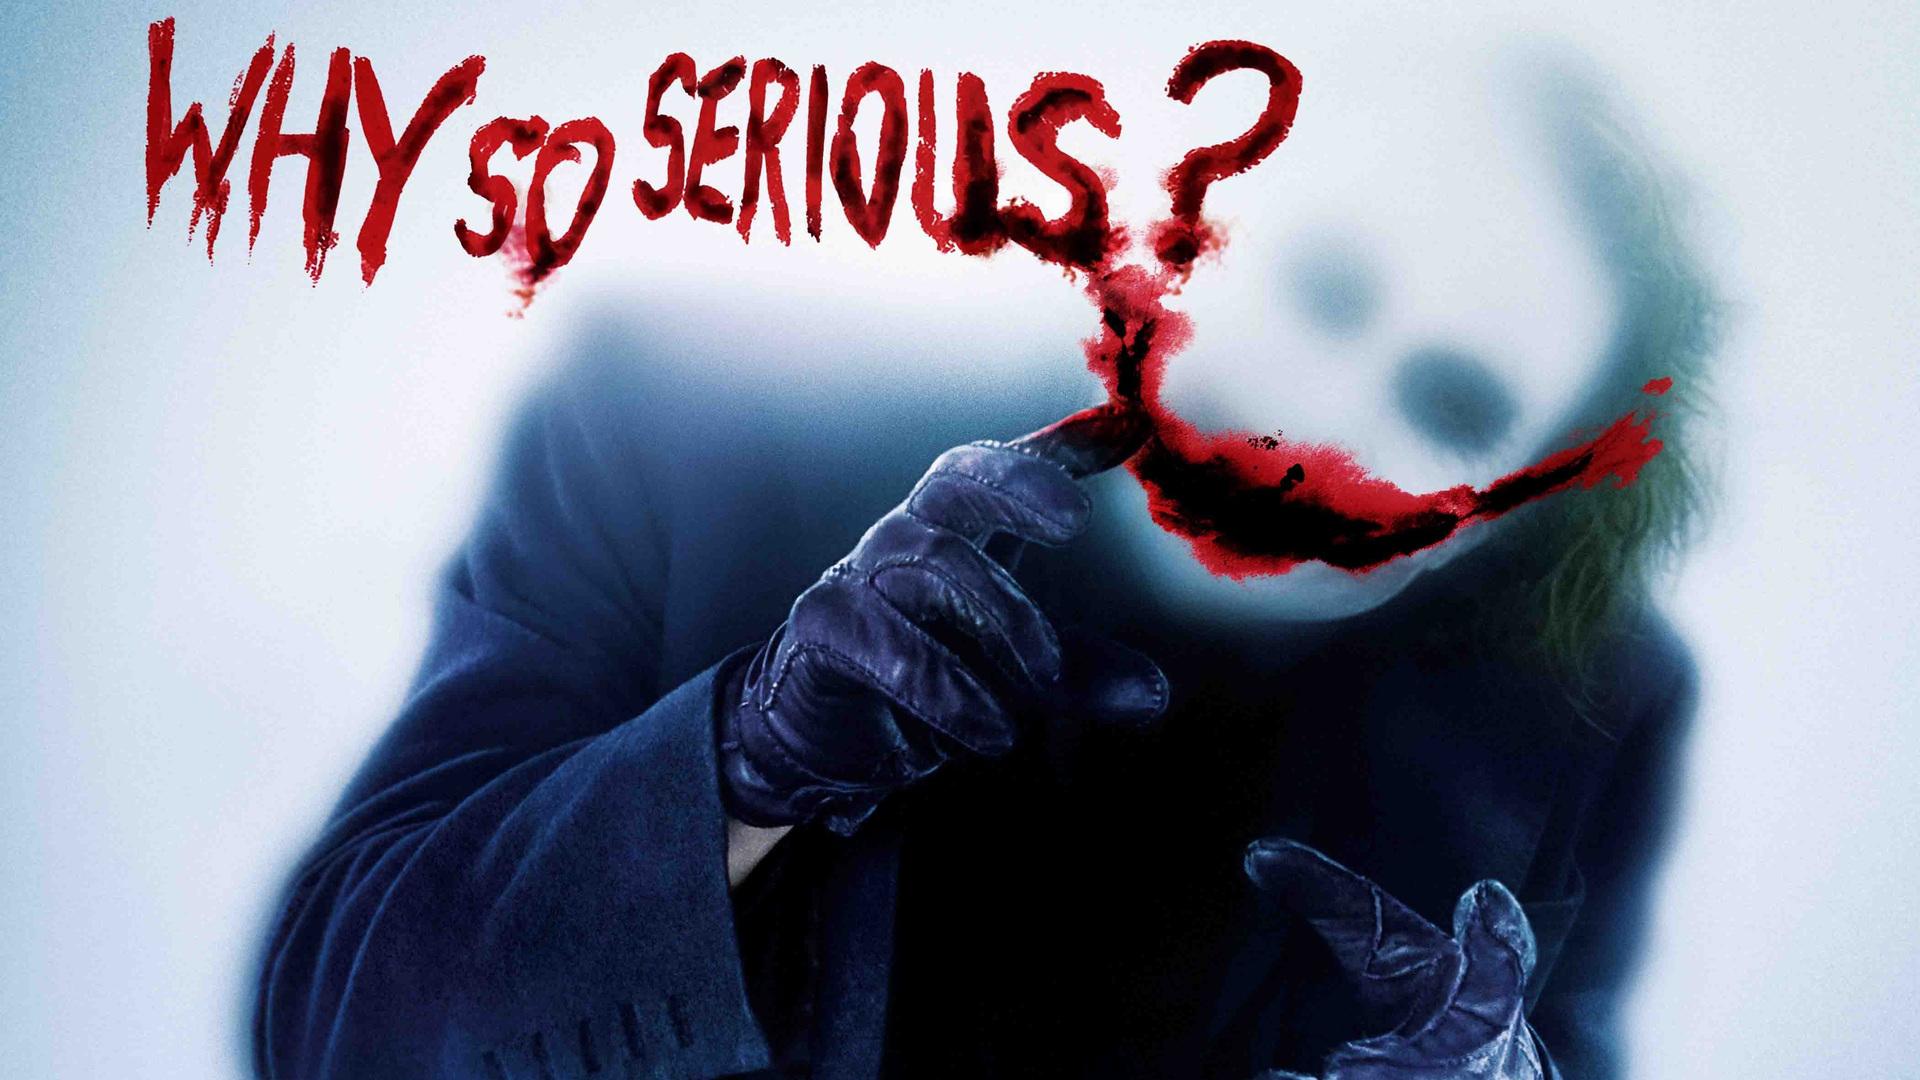 1920x1080 Joker Why So Serious Laptop Full HD 1080P HD 4k ...